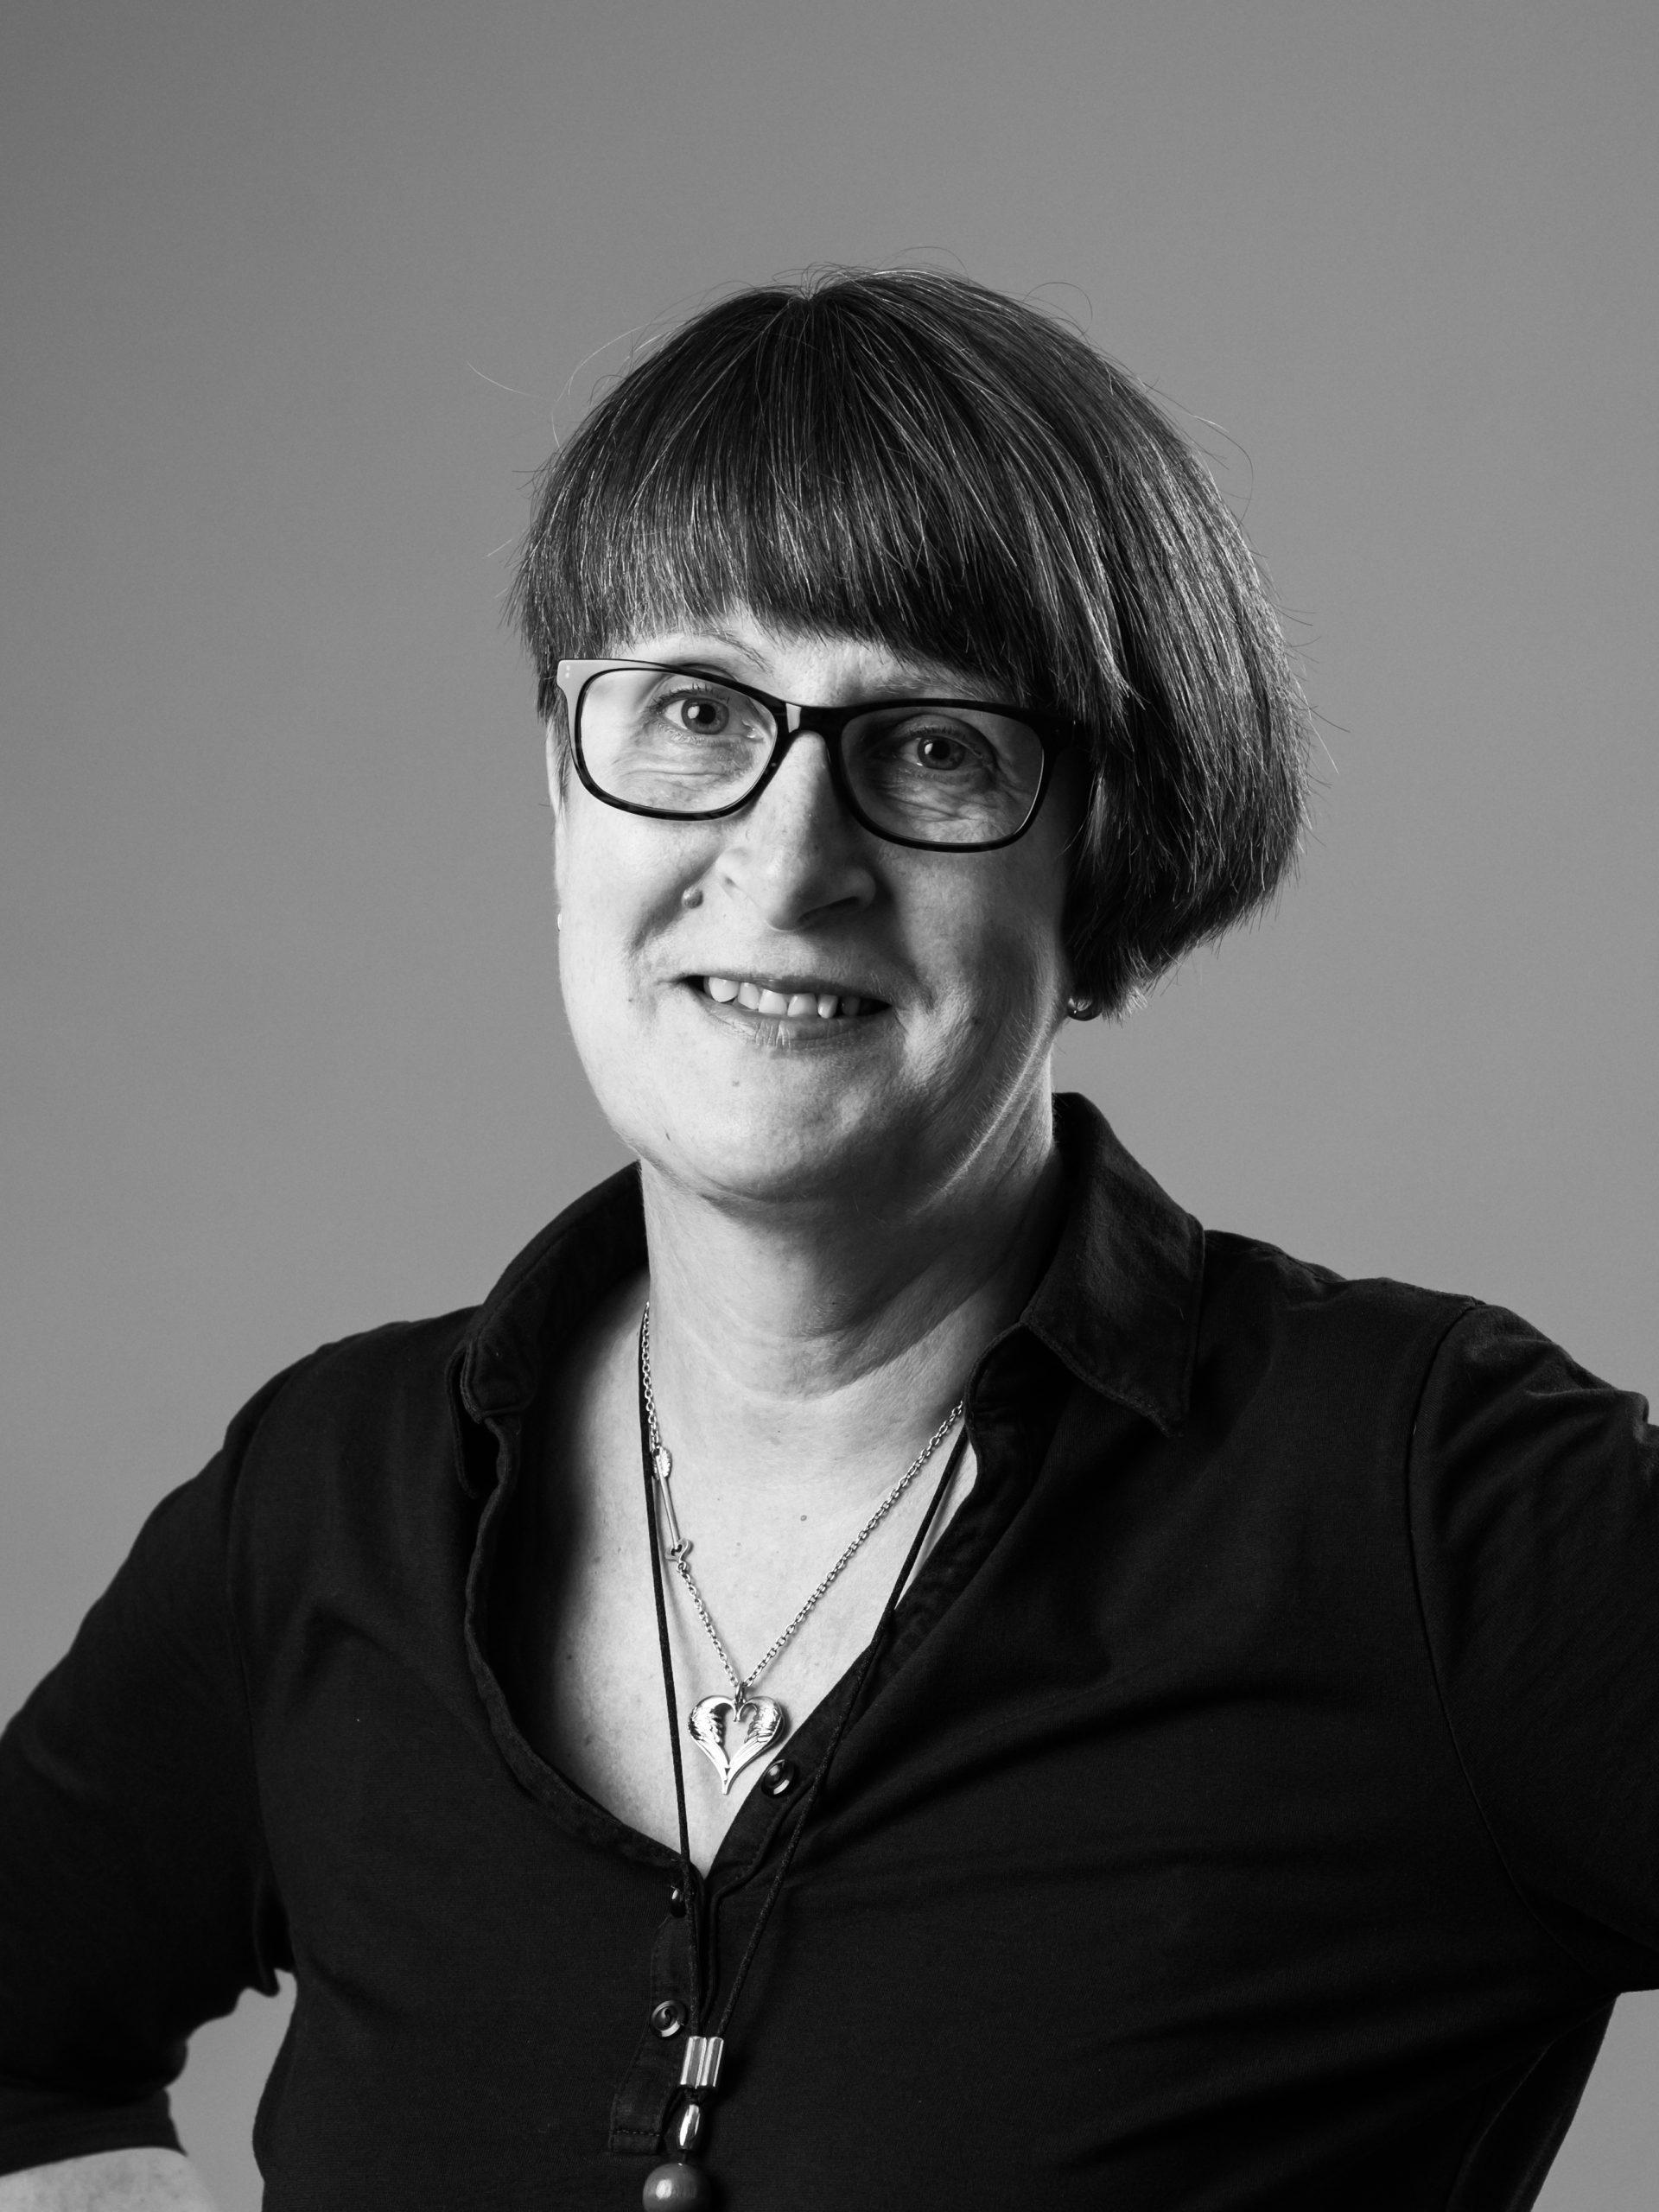 Nina Wihlman